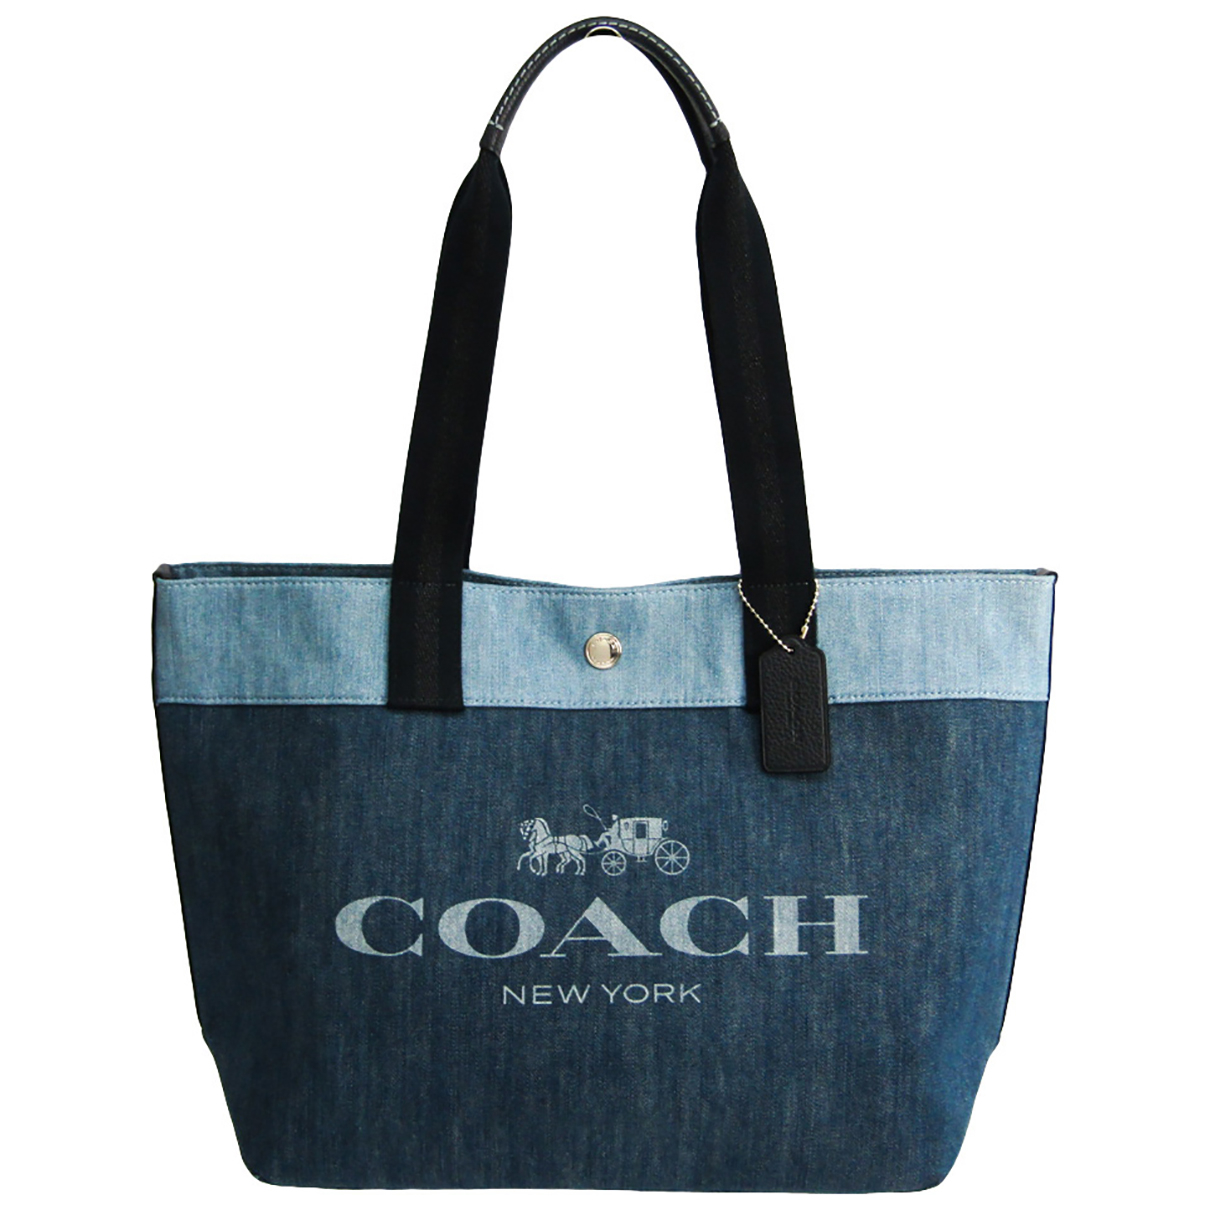 Coach - Sac a main   pour femme en denim - bleu